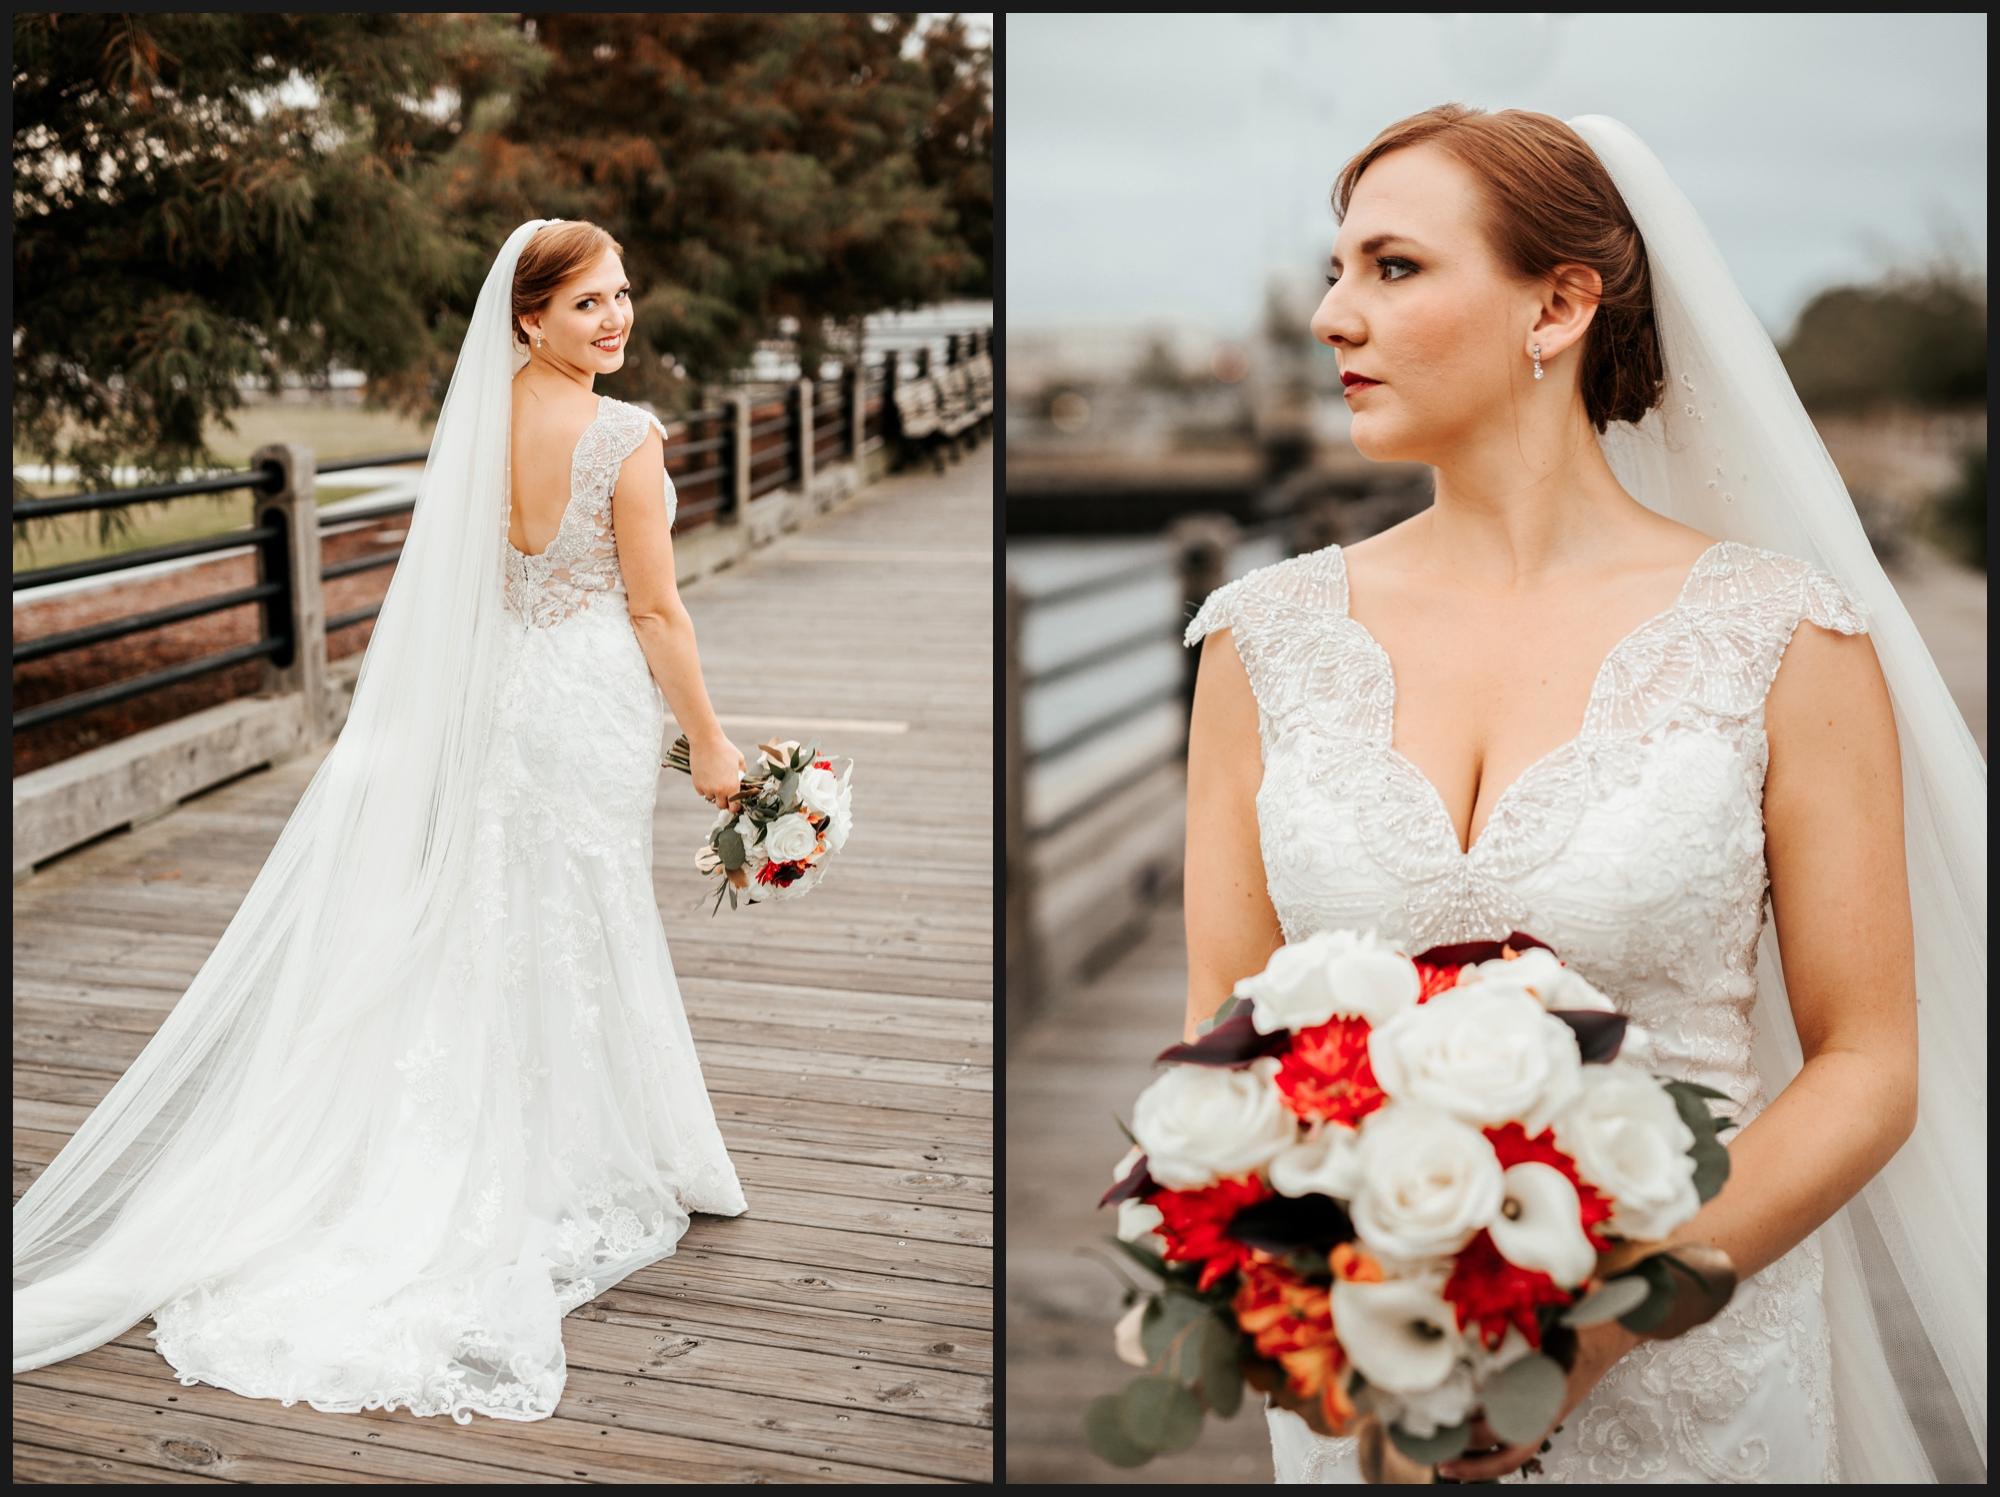 Orlando-Wedding-Photographer-destination-wedding-photographer-florida-wedding-photographer-bohemian-wedding-photographer_0564.jpg